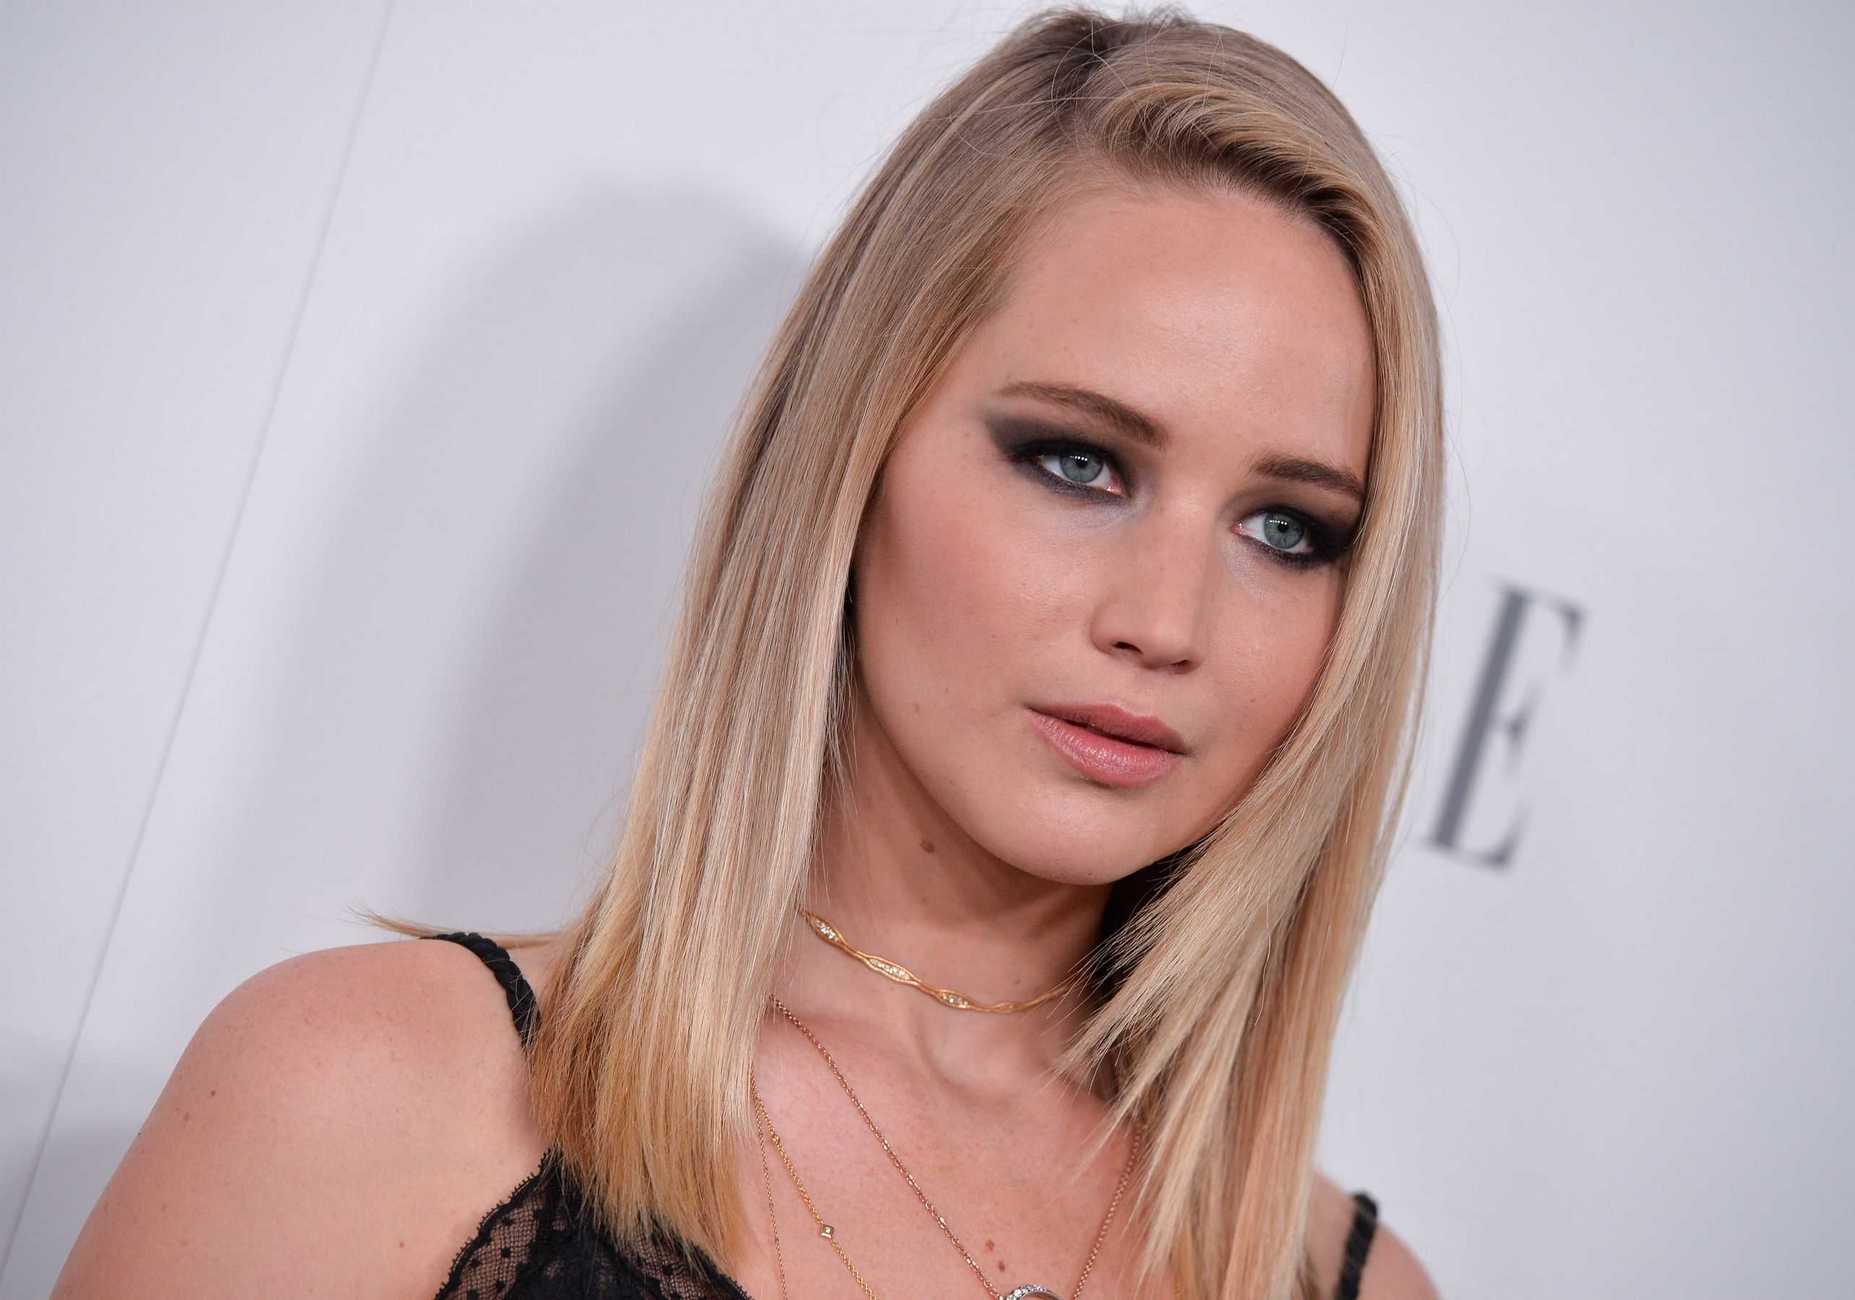 http://jenniferlawrencedaily.com/gallery/albums/userpics/10001/Jennifer_Lawrence_-_ELLE_s_24th_Annual_Women_in_Hollywood_Celebration_on_October_16-11.jpg